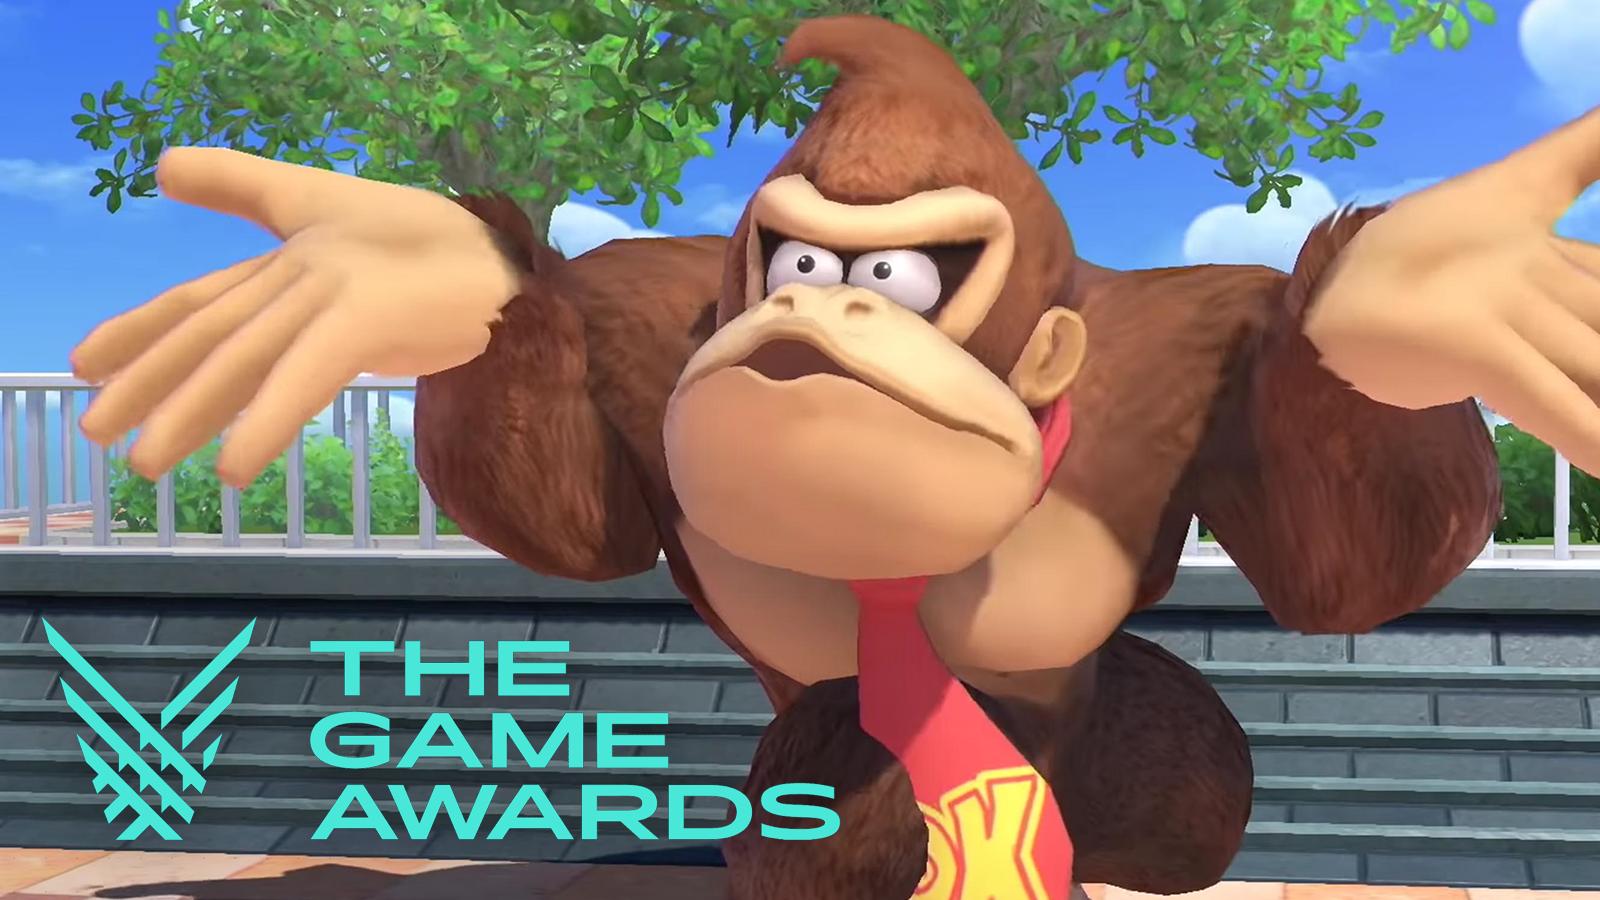 Nintendo / The Game Awards